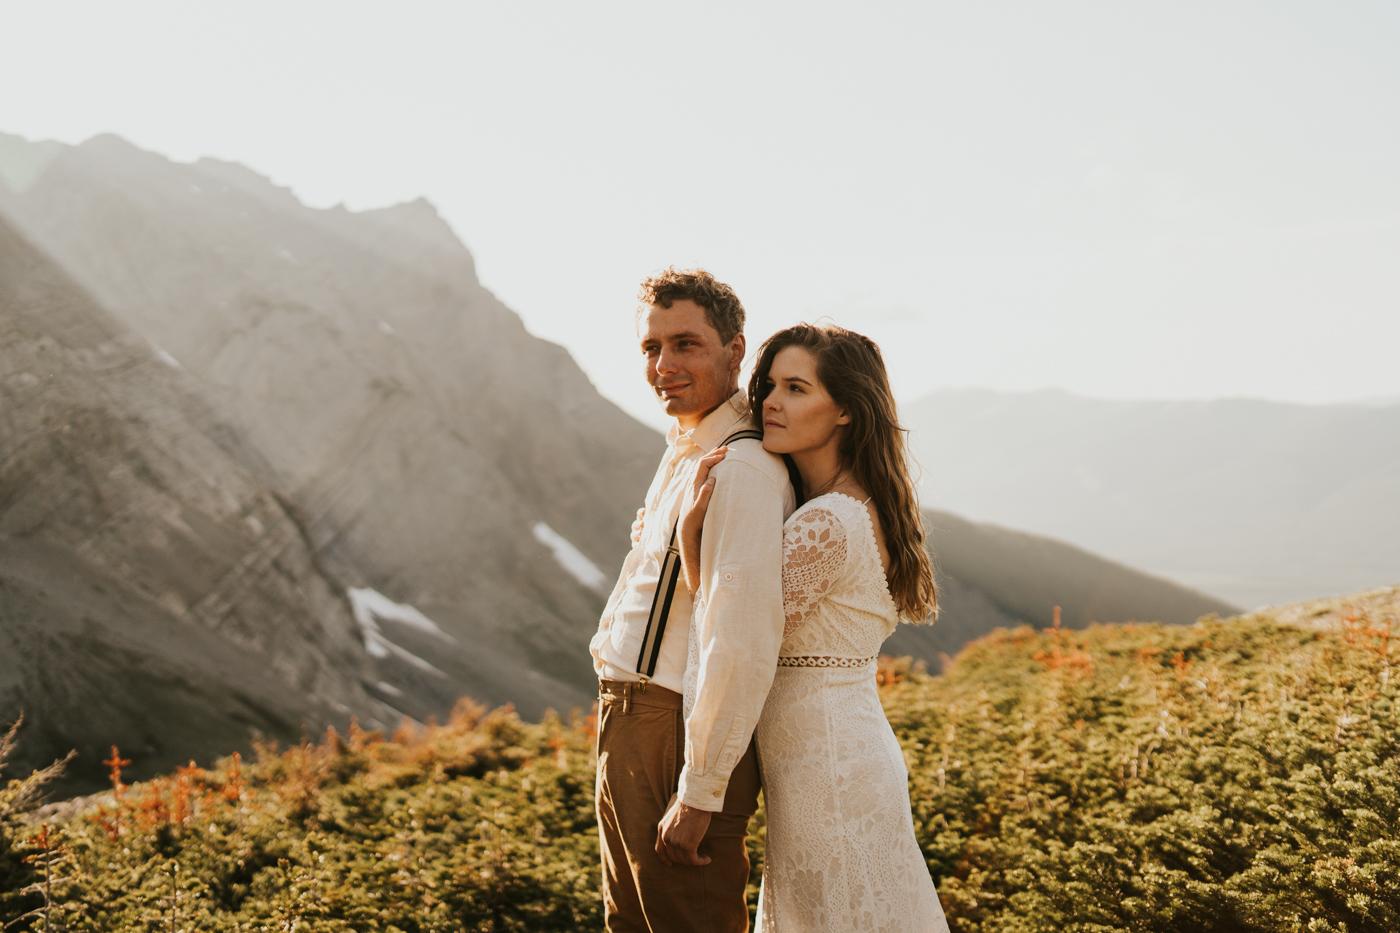 tyraephotography_photographer_wedding_elopement_engagement_photography-08380.jpg